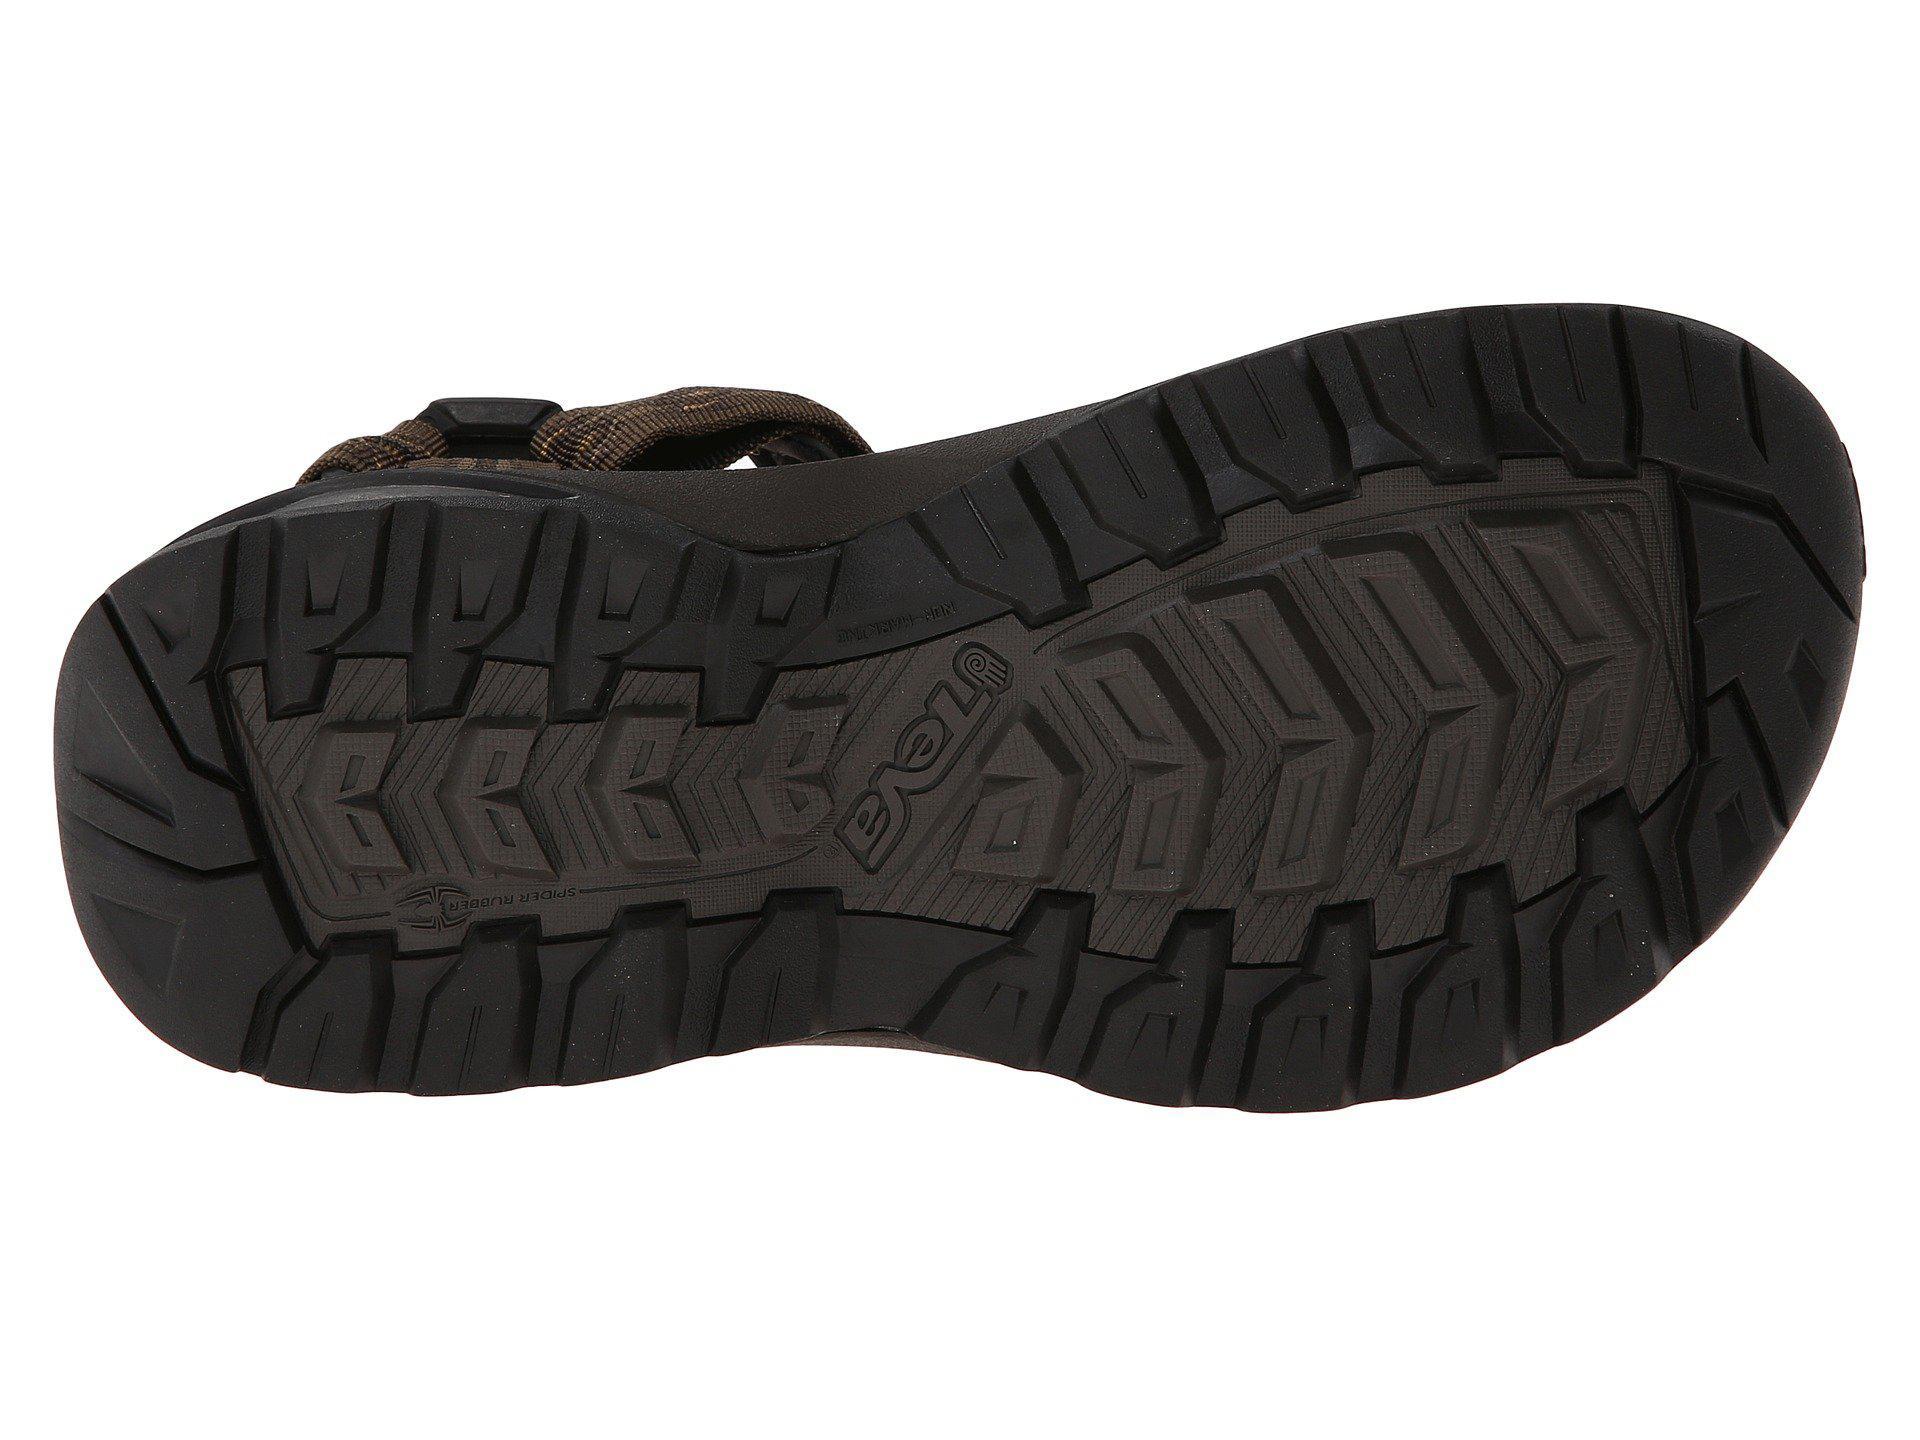 32274dd3efe7 Teva - Green Terra Fi 4 (firetread Midnight) Men s Shoes - Lyst. View  fullscreen